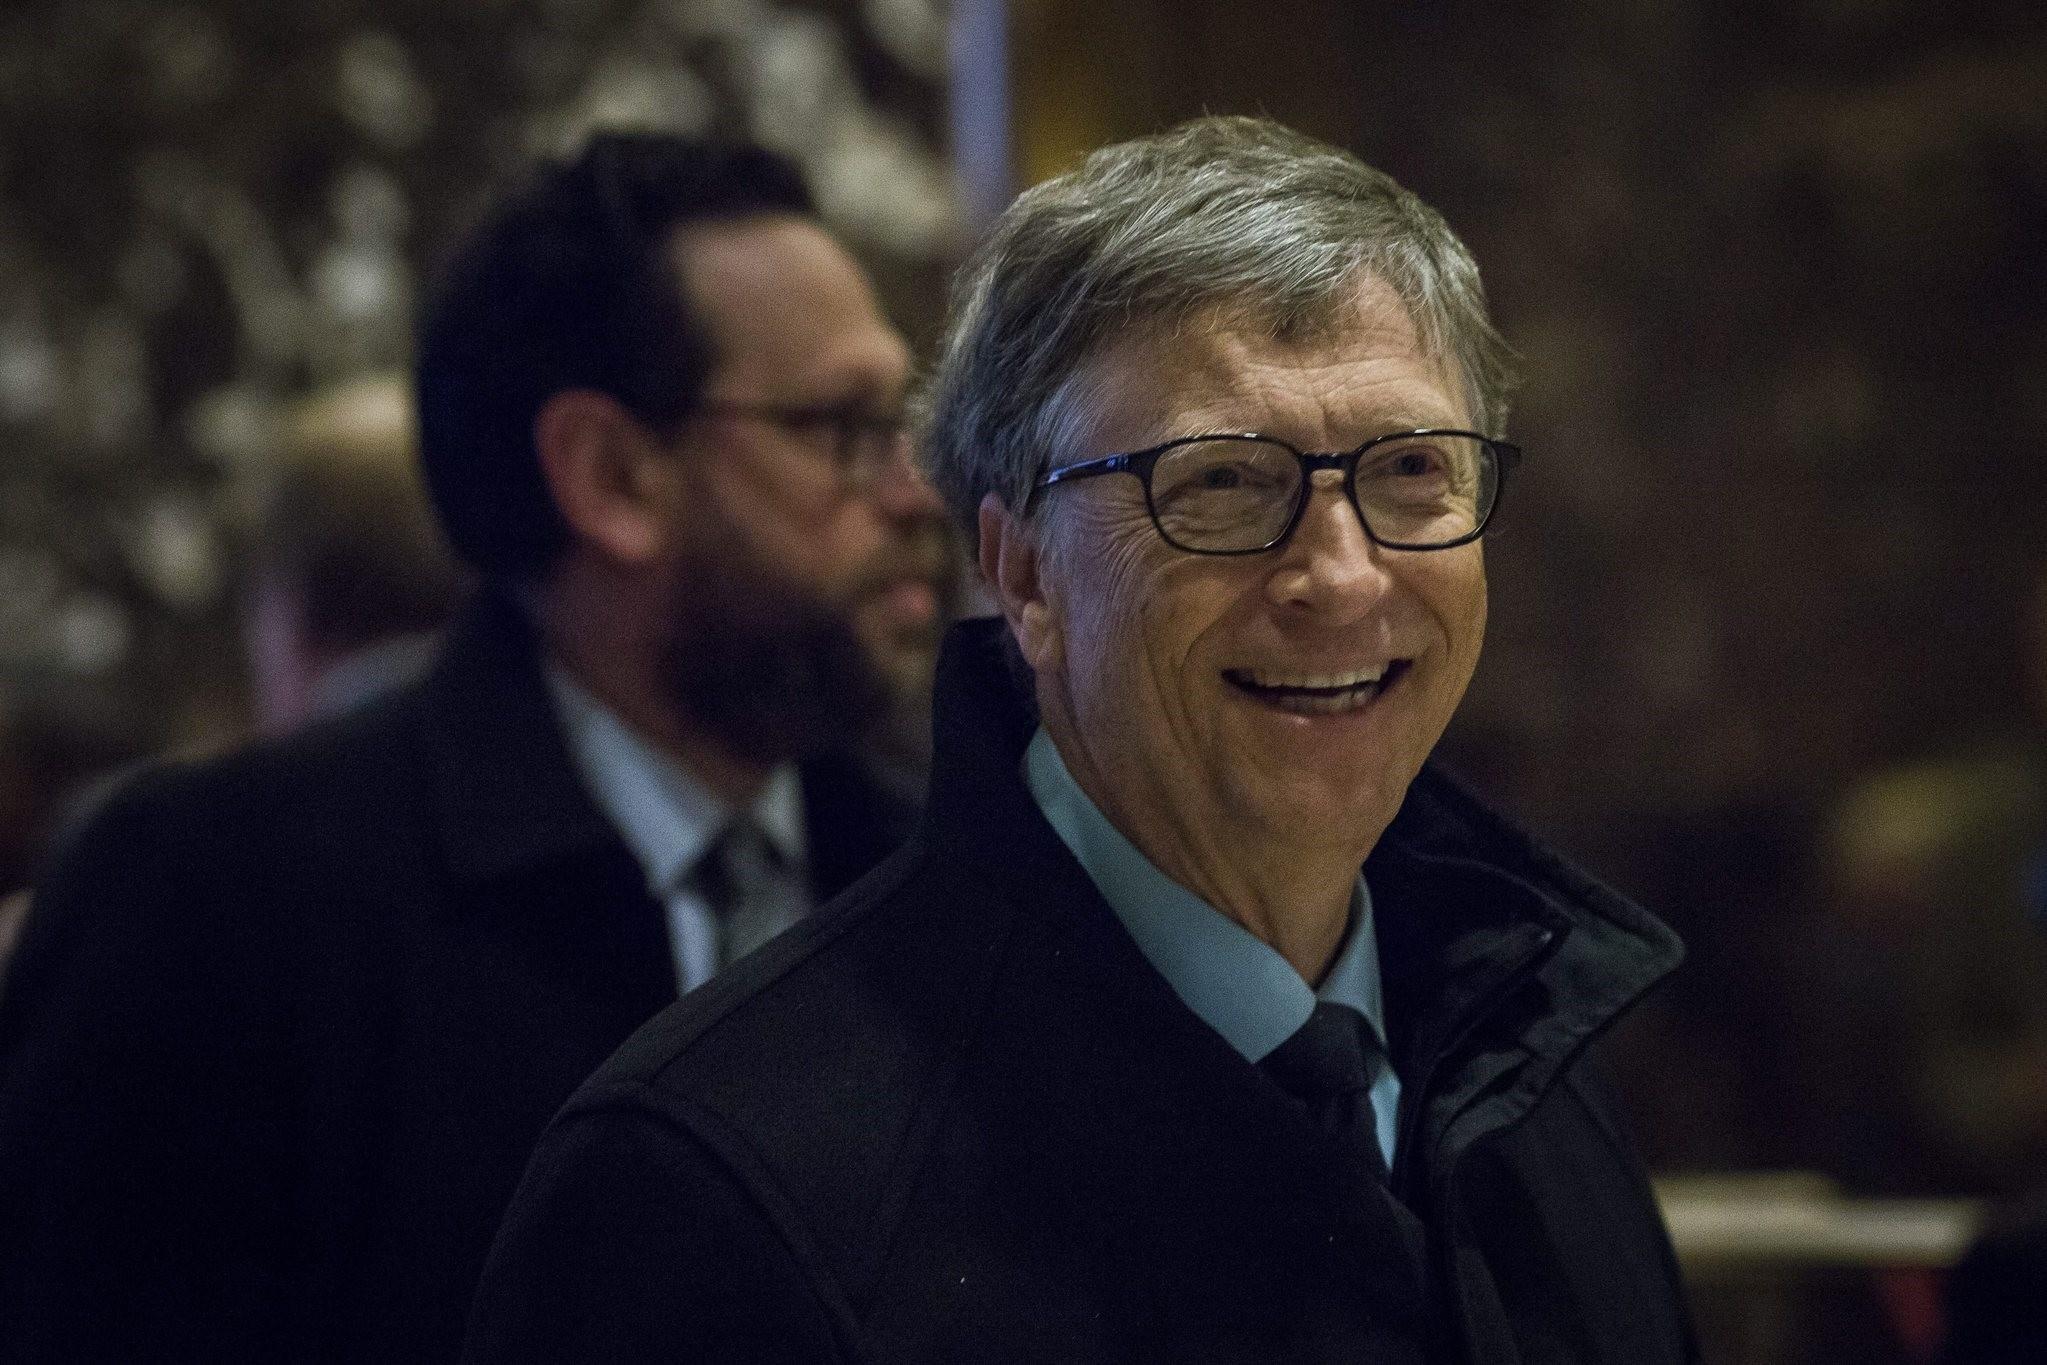 U.S. businessman Bill Gates arrives at Trump Tower in Manhattan, New York, 13 Dec 2016. (EPA Photo)